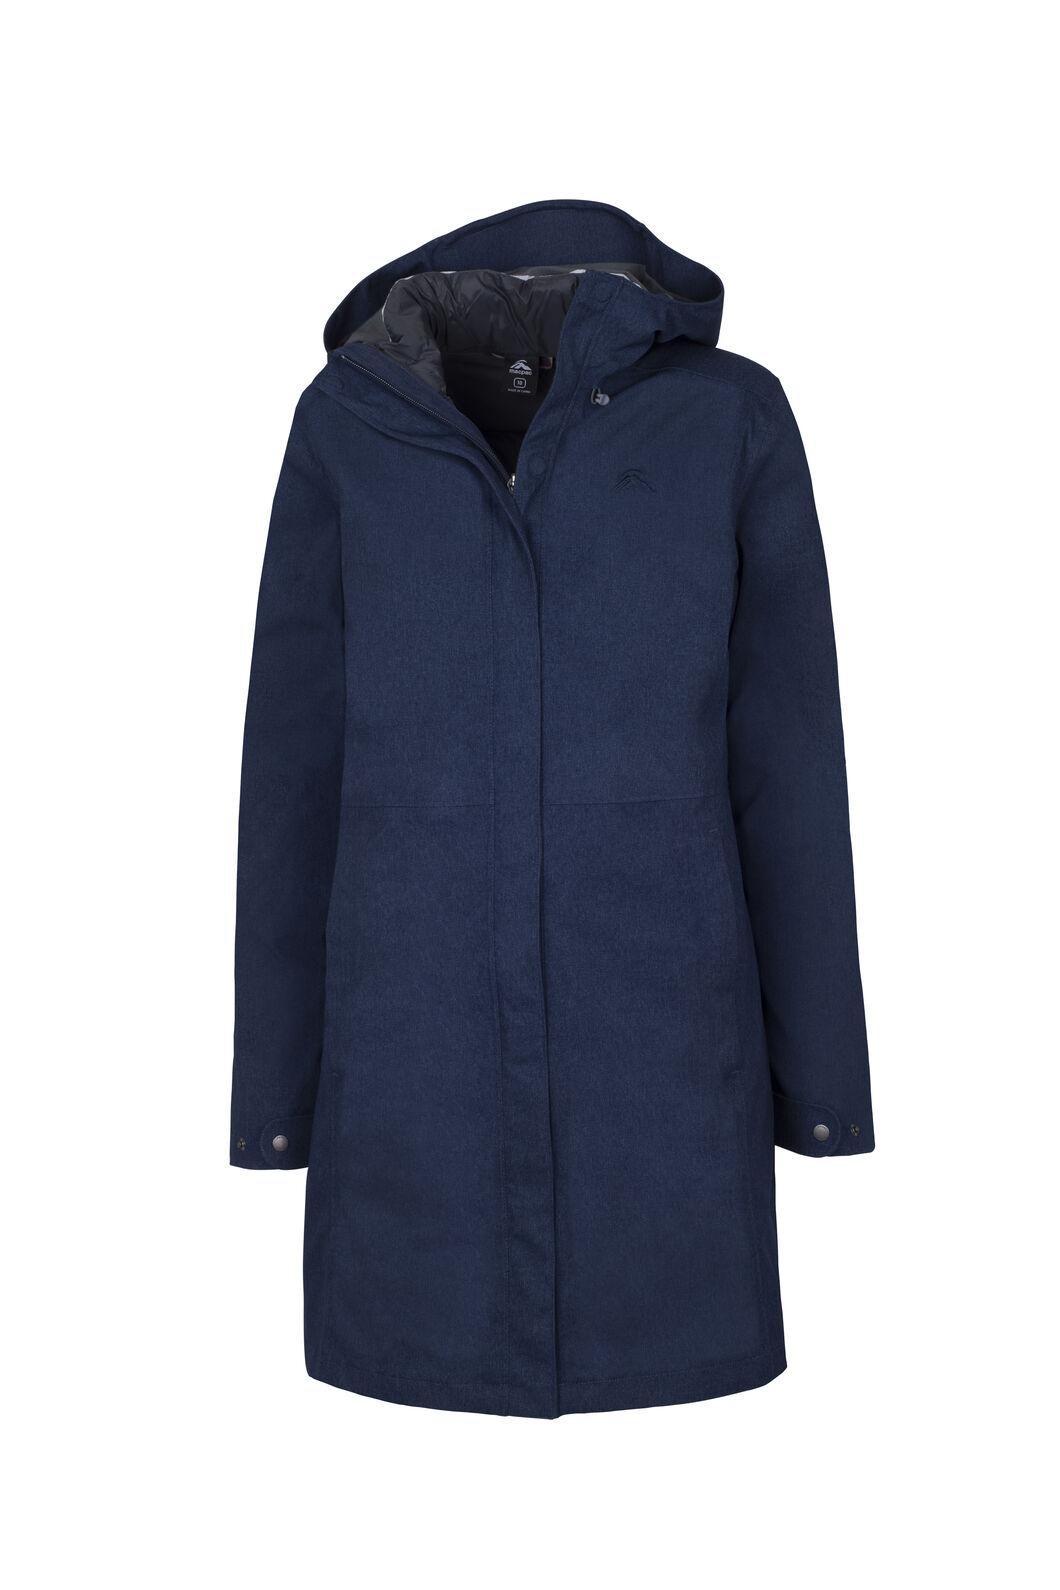 Macpac Element Three-In-One Coat - Women's, Black Iris, hi-res